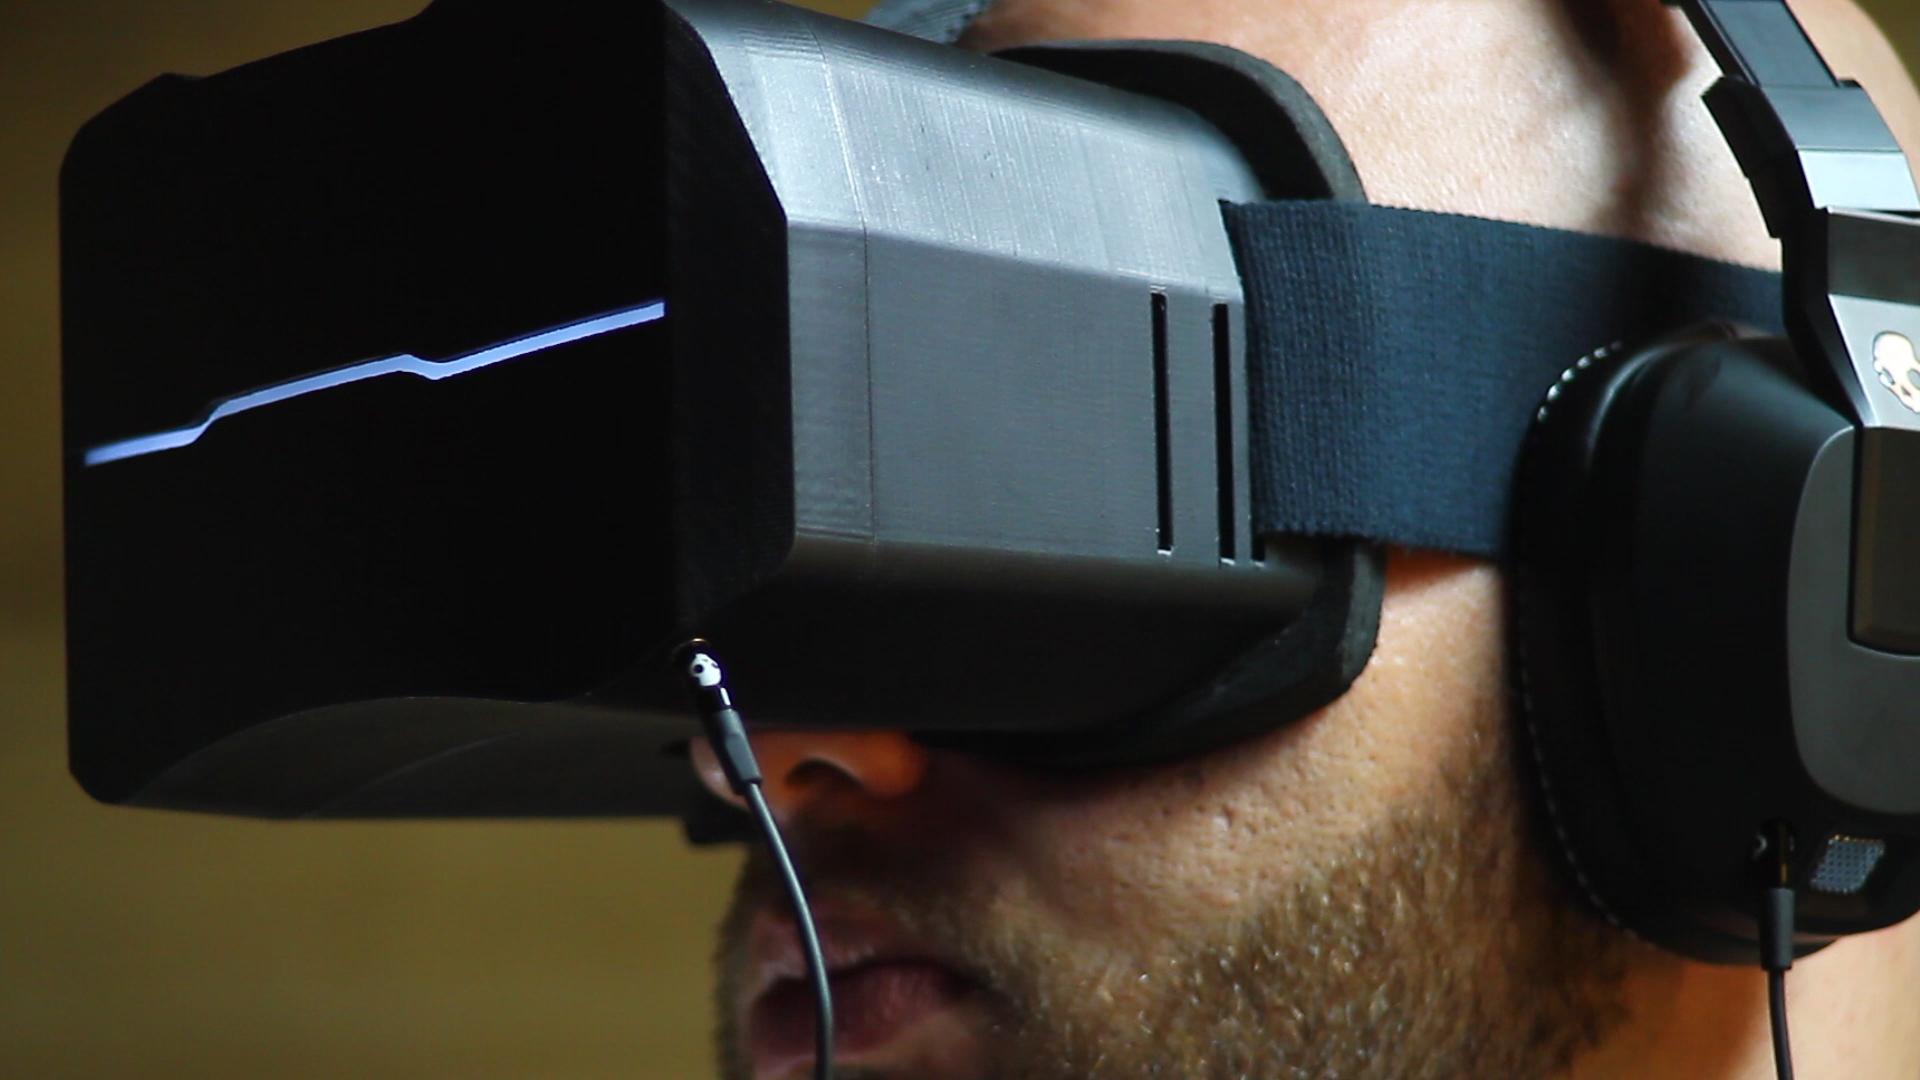 Visus VR Headset